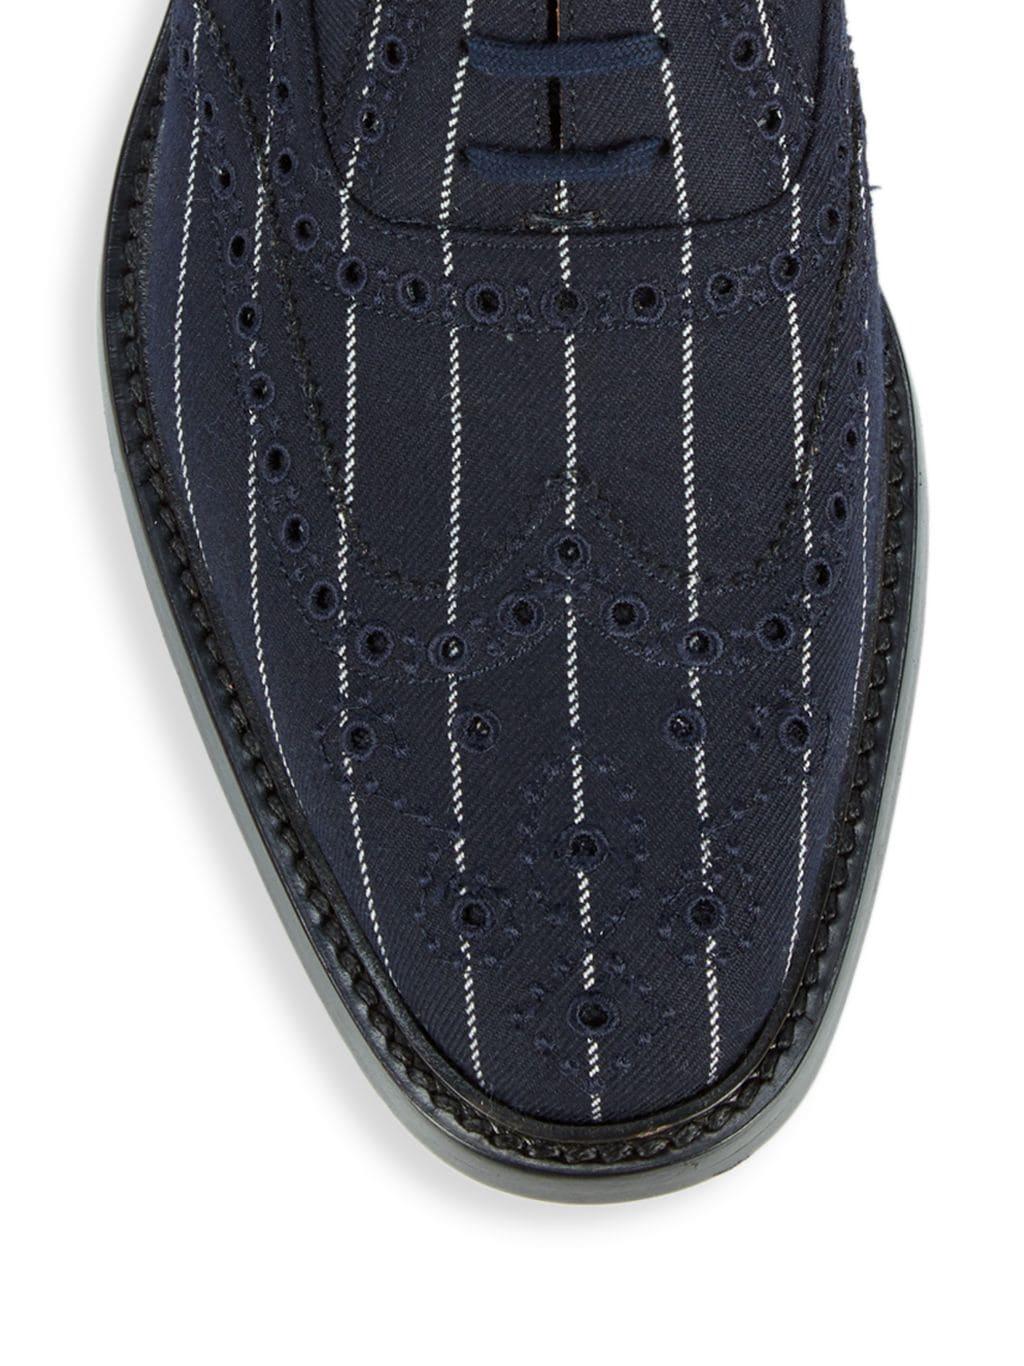 Burberry Lennard Tailor Textile Pinstripe Oxfords